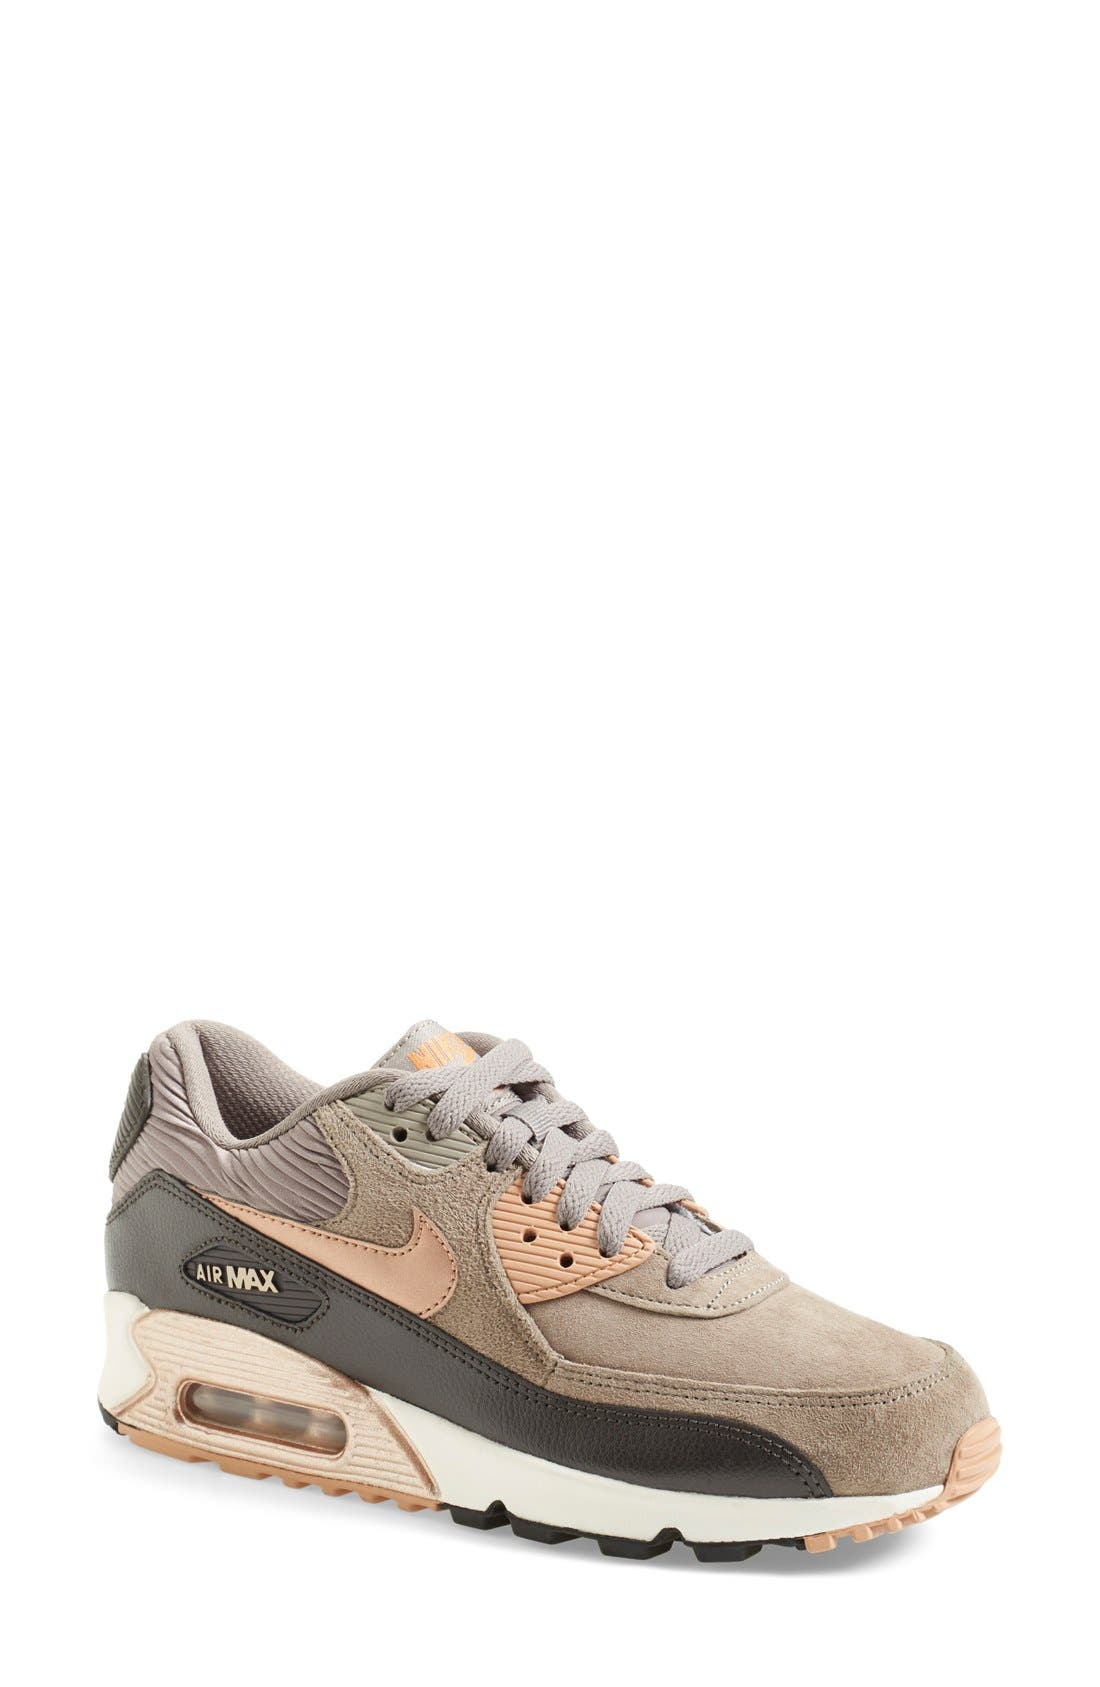 'Air Max 90' Sneaker,                             Main thumbnail 1, color,                             020